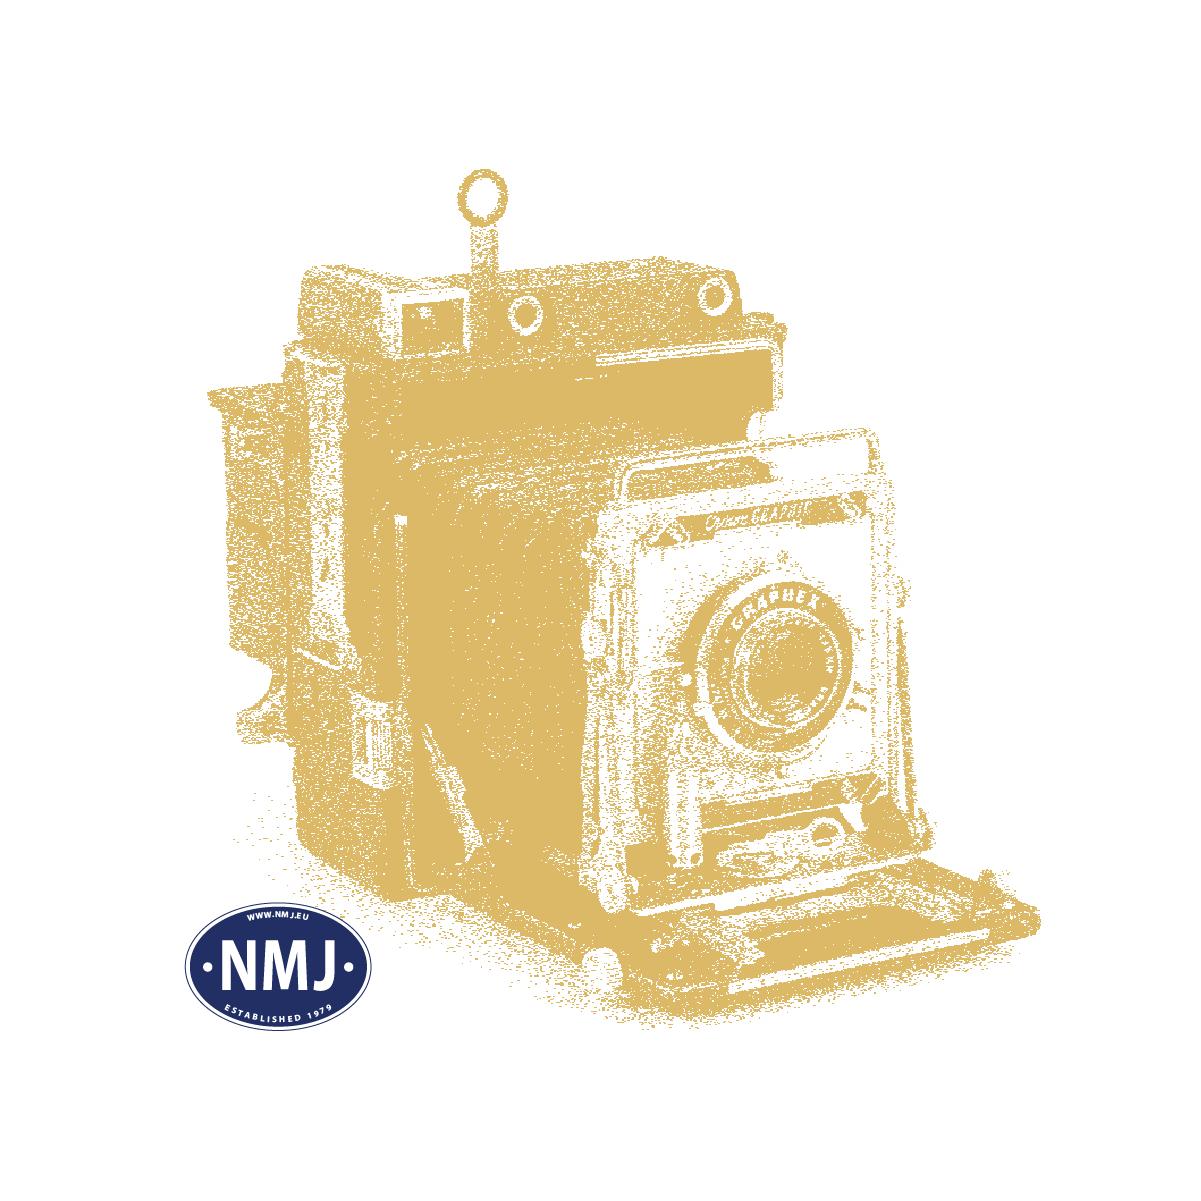 NJK50 - Norsk Jernbaneklubb 50 år, Jubileumsbok